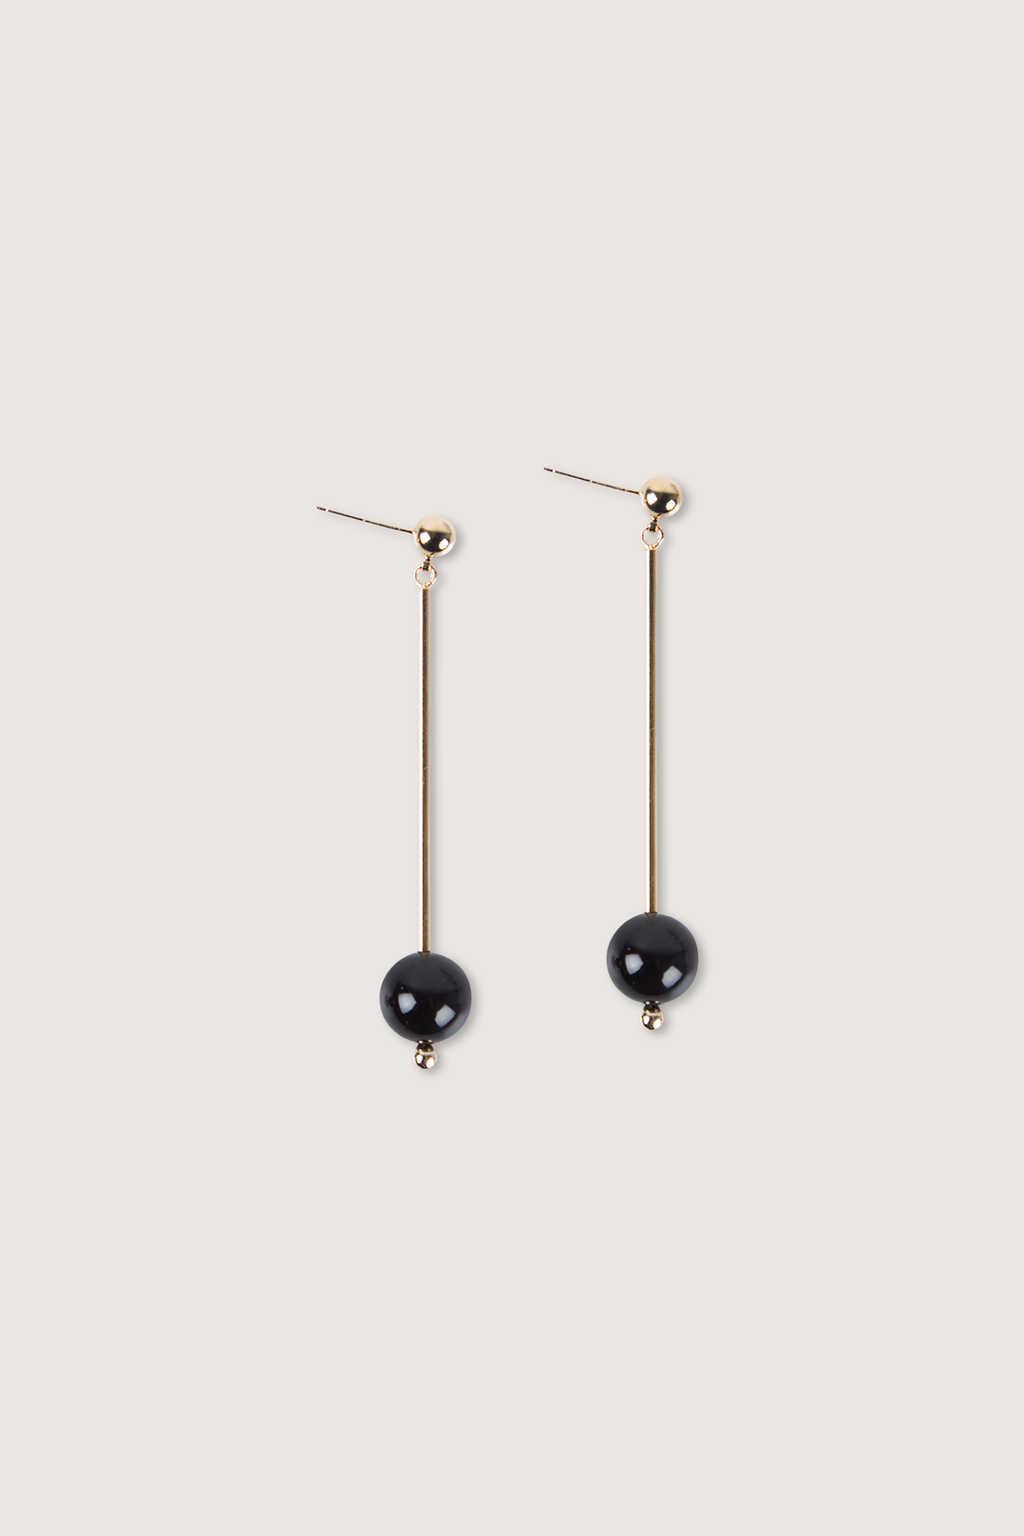 Earring H258 Gold 1